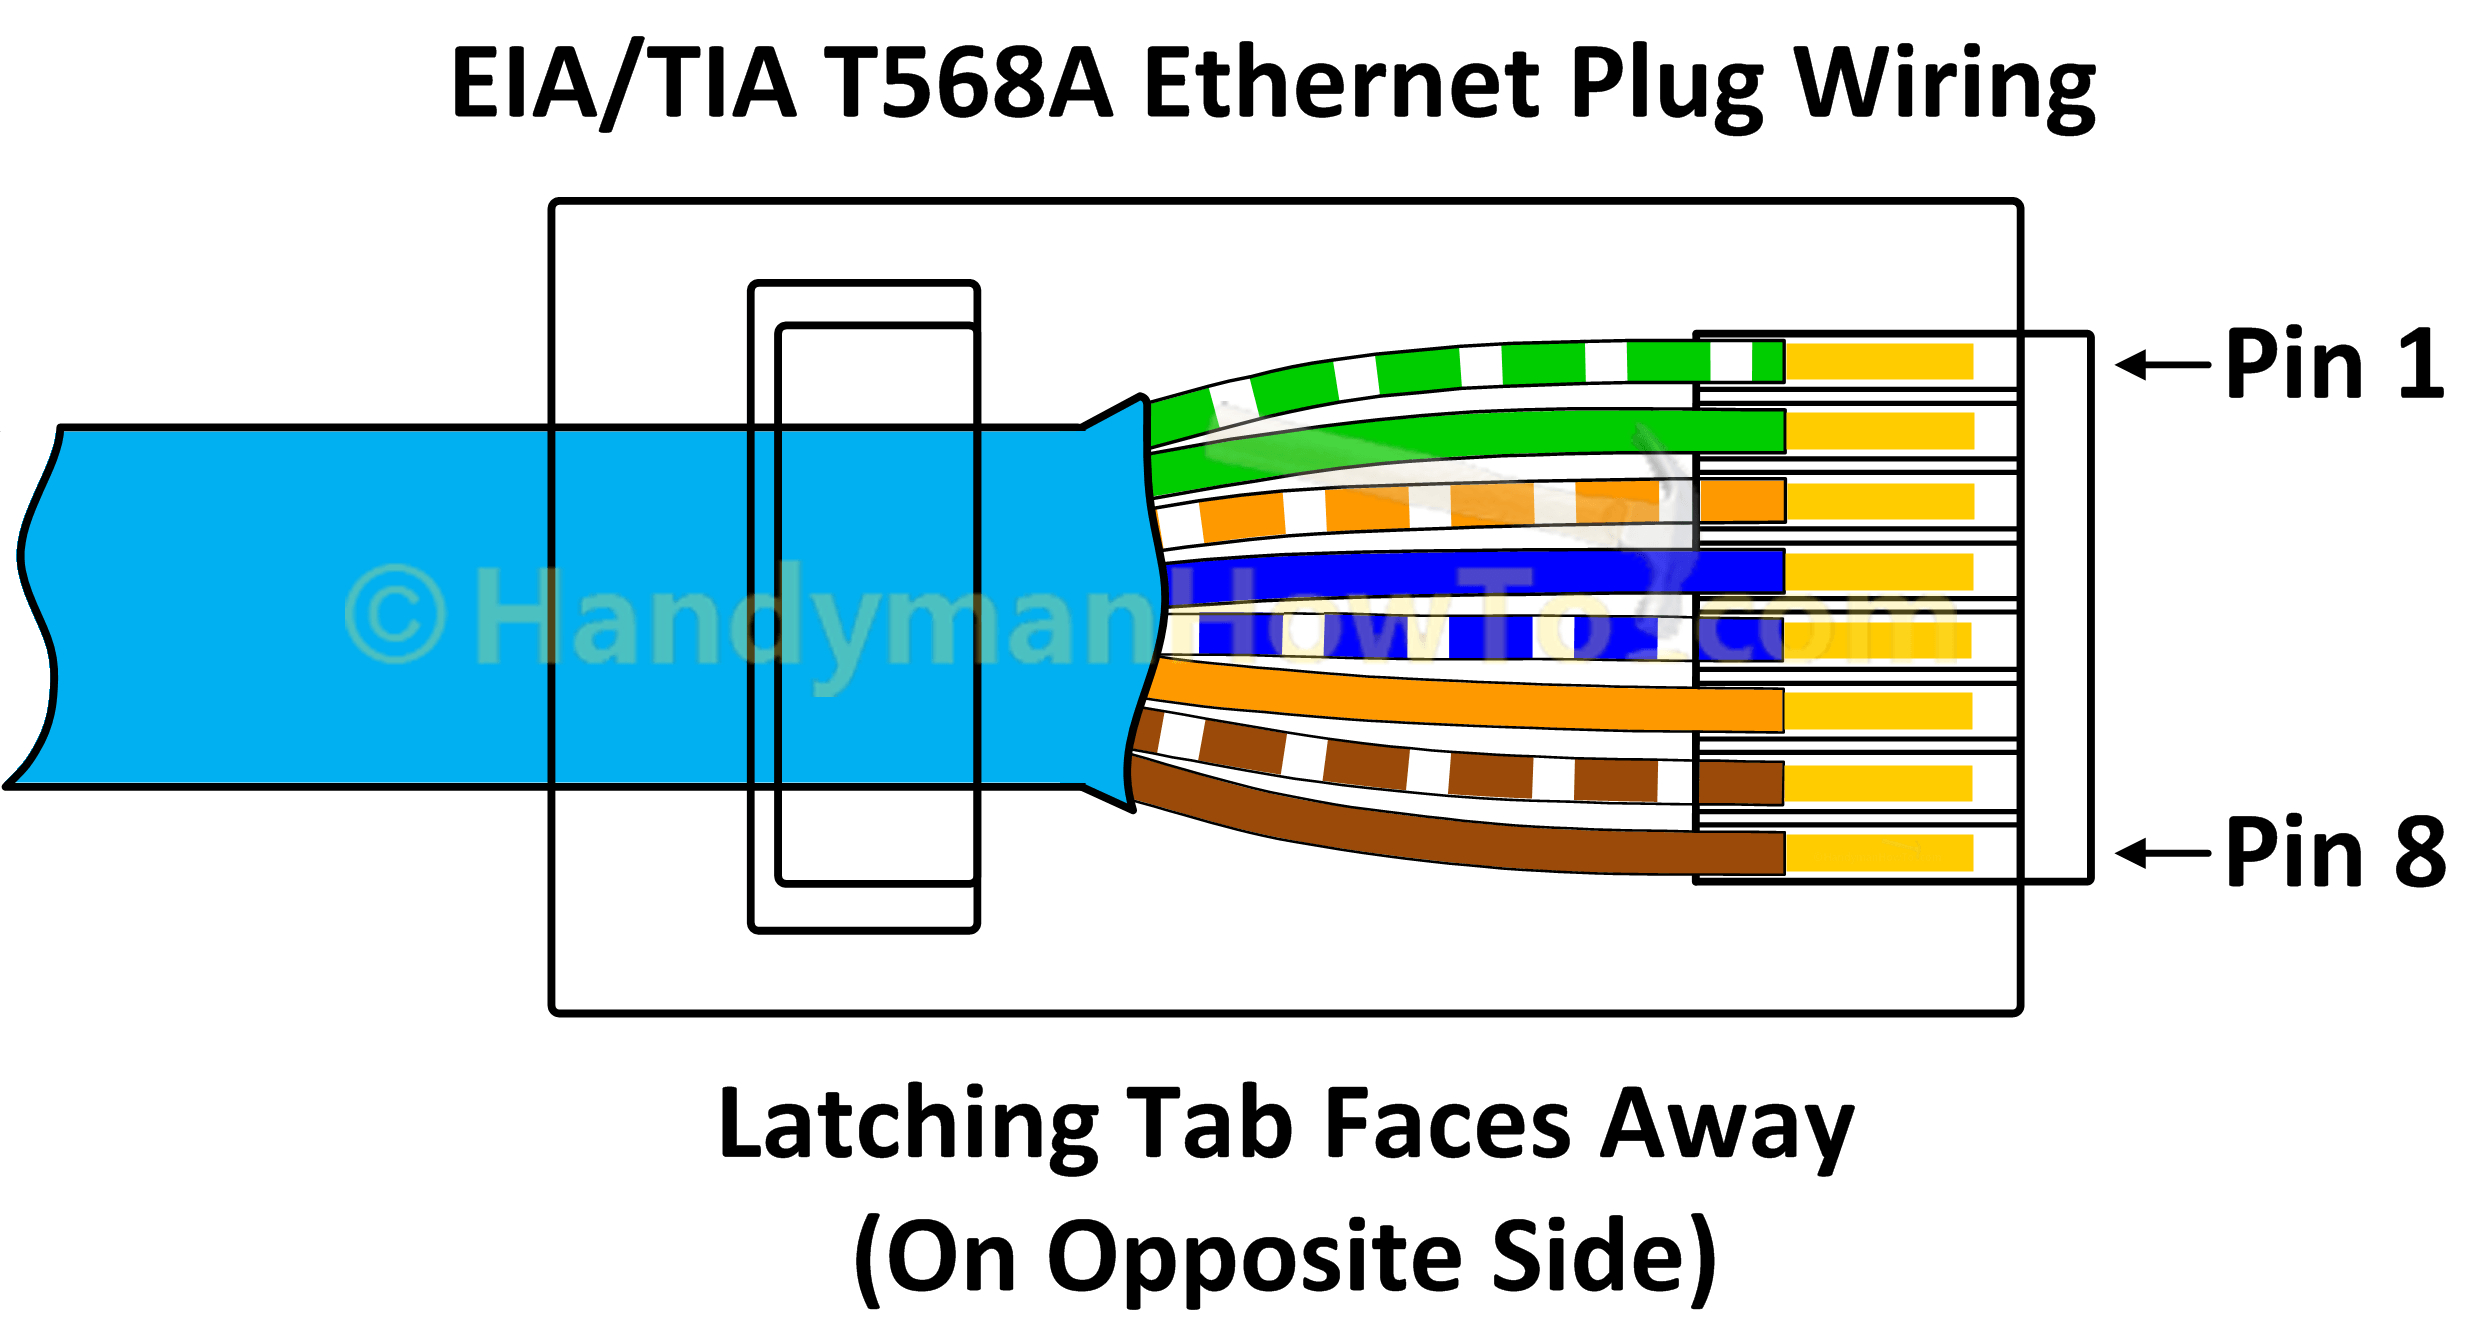 Cat5E Rj45 Wiring Diagram - Wiring Diagrams Hubs - Rj45 Wall Socket Wiring Diagram